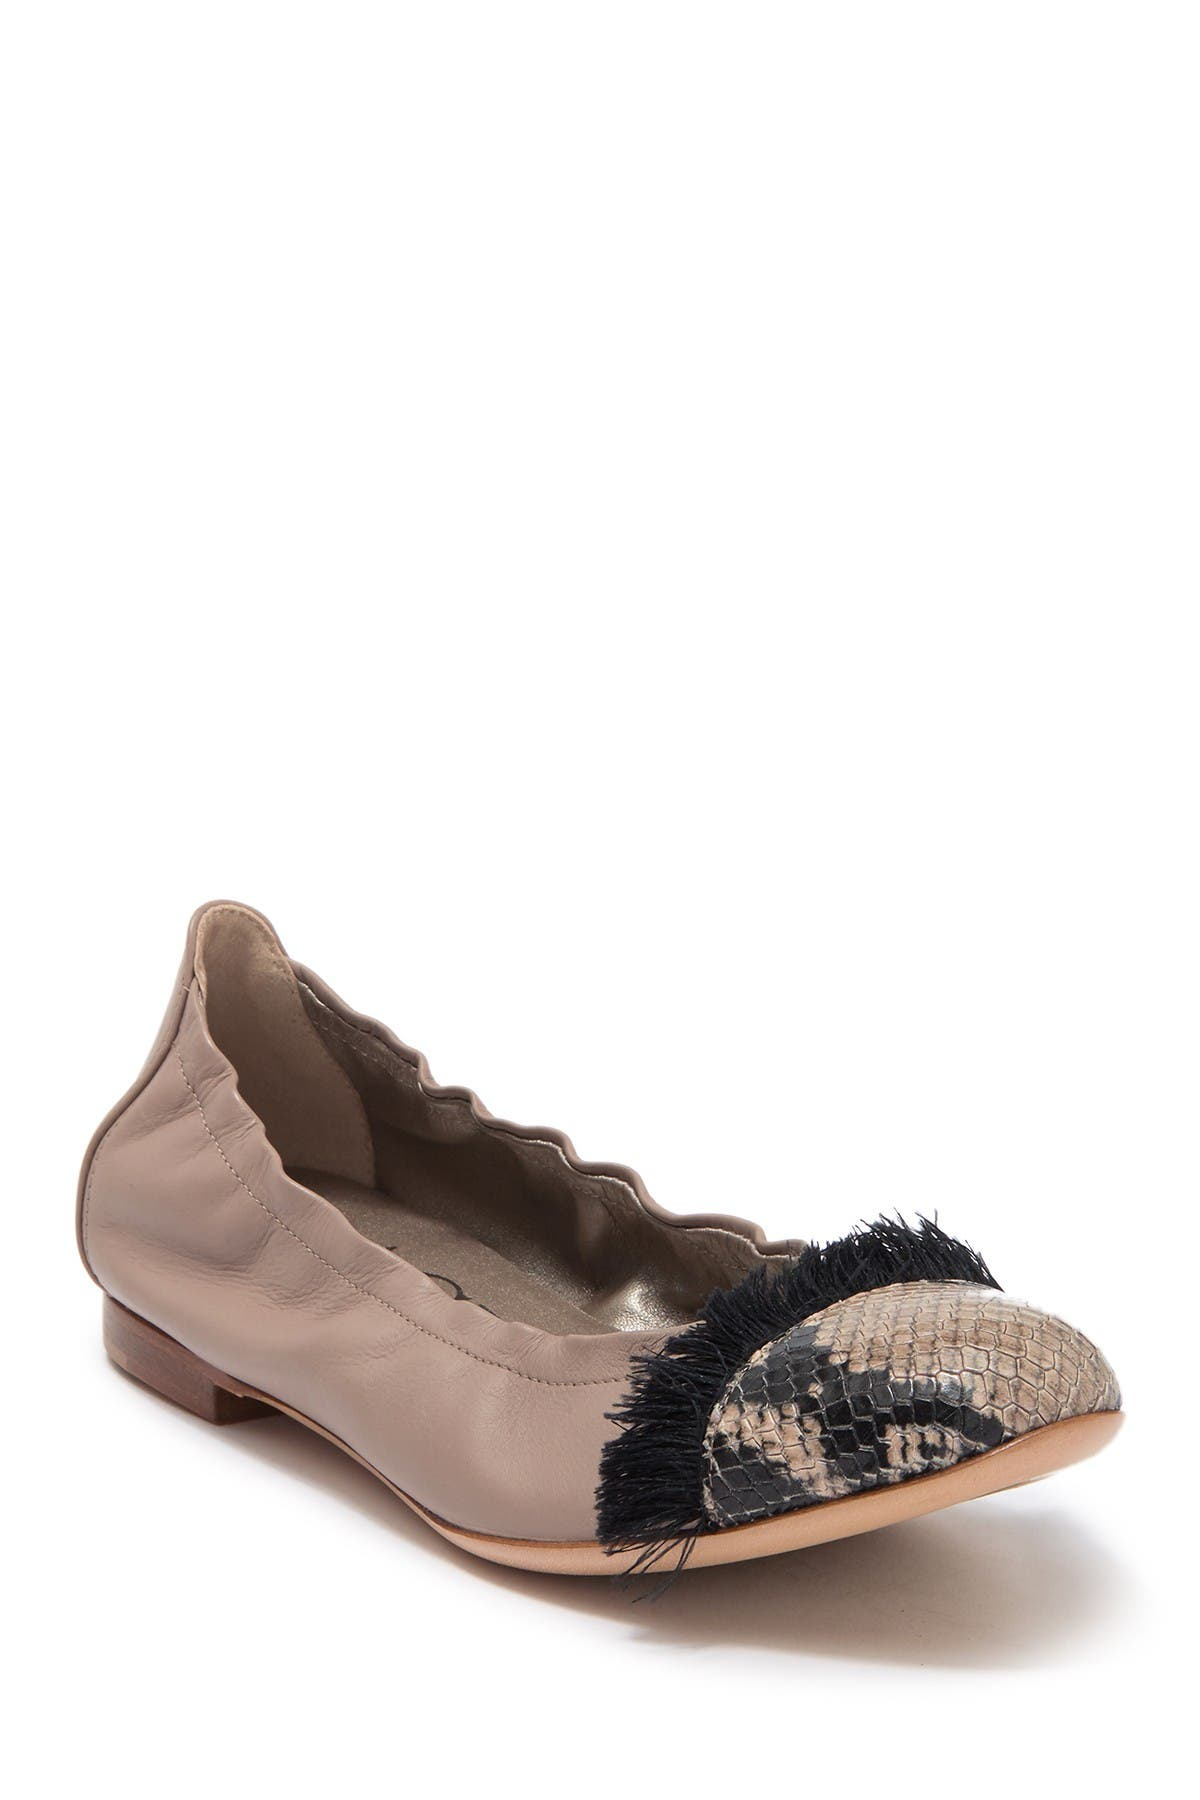 Image of AGL Cap Toe Tassel Trim Ballet Flat